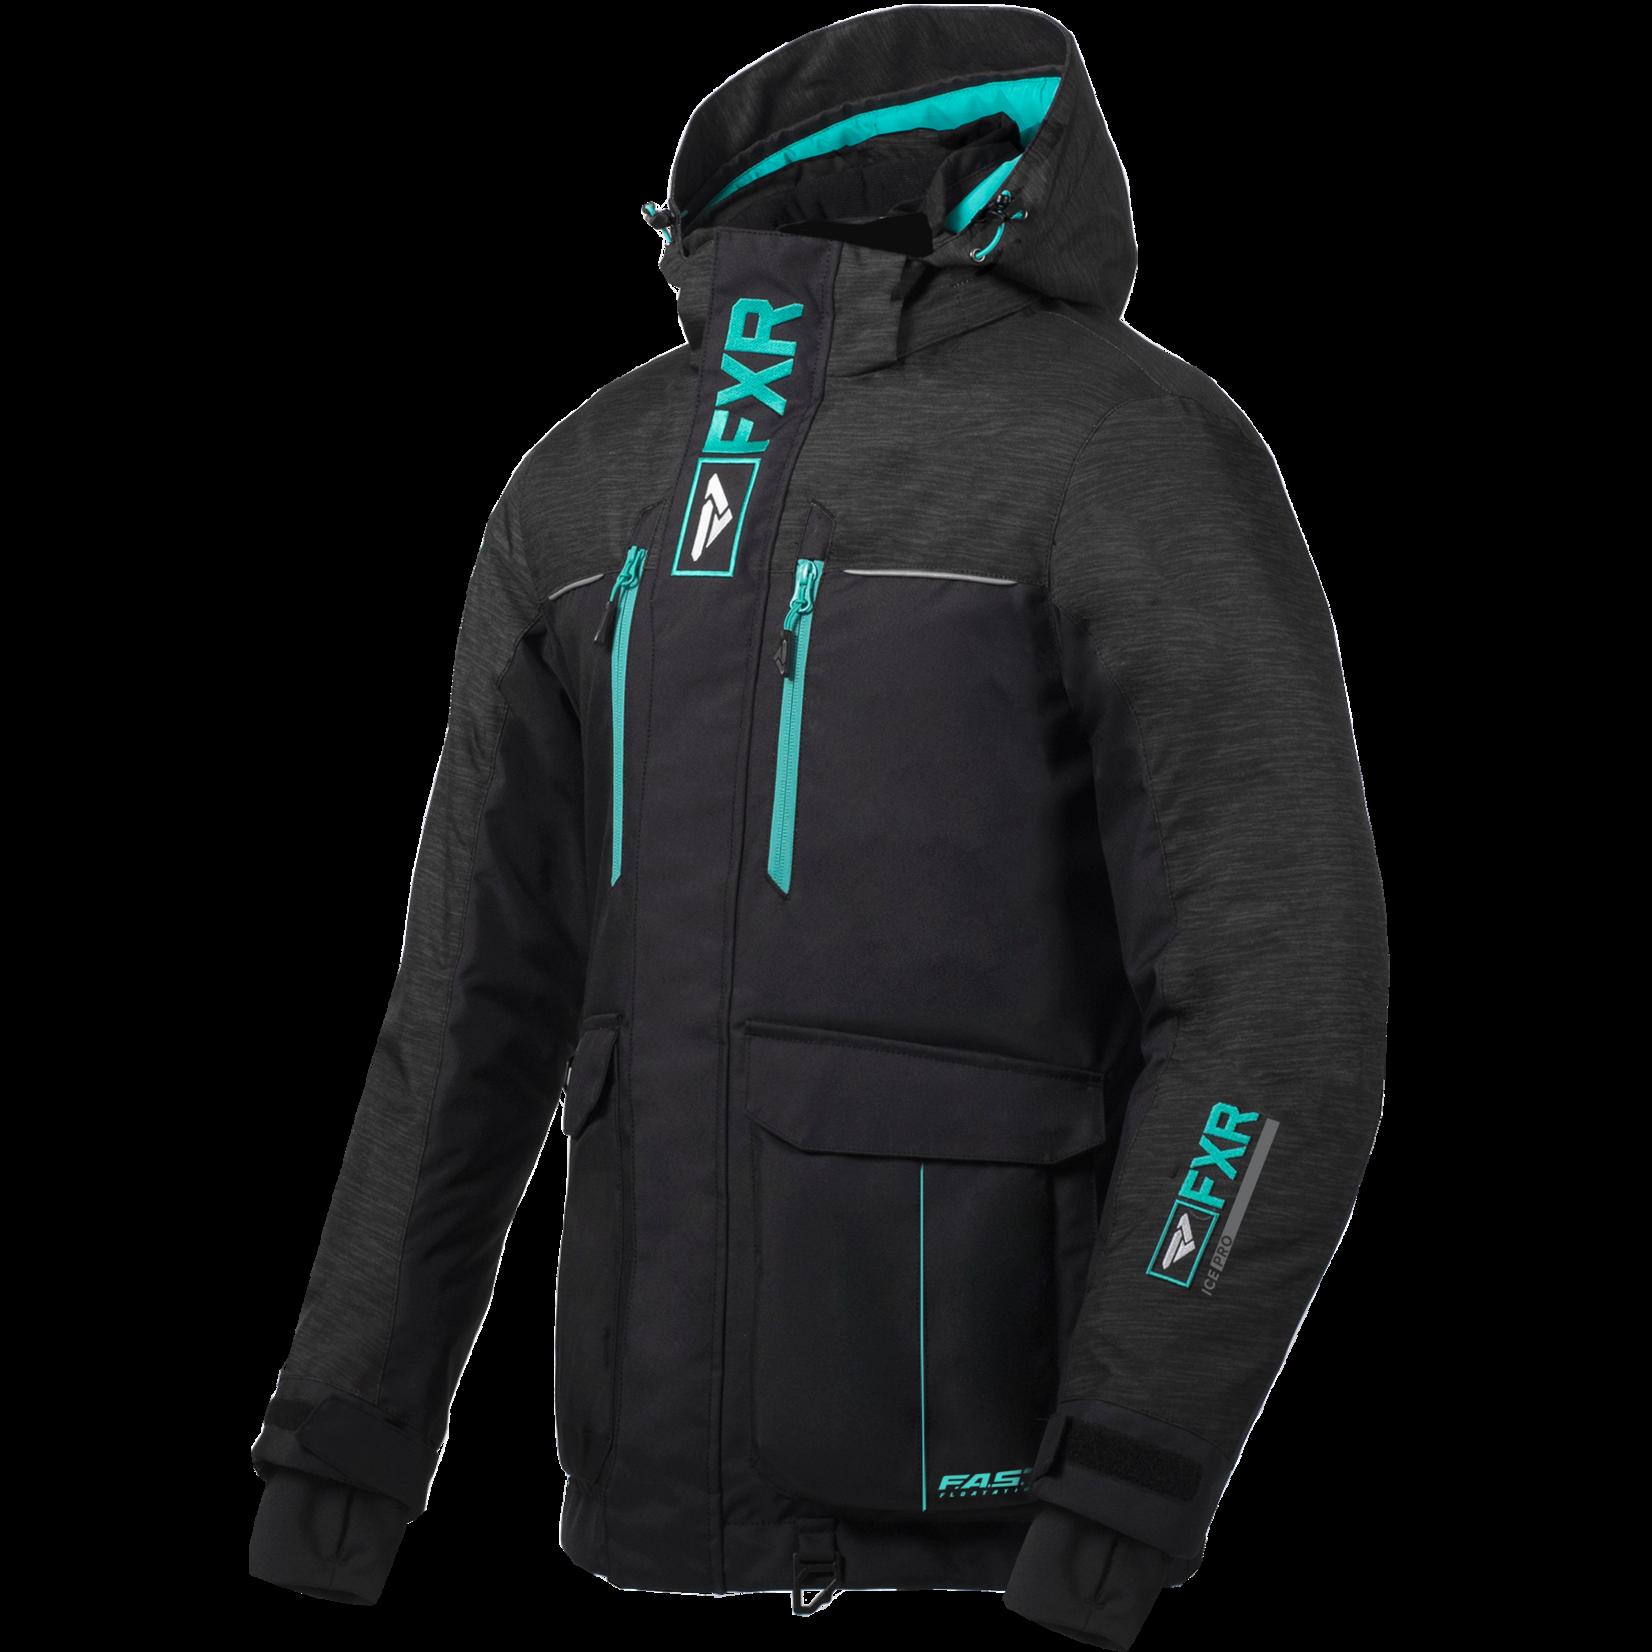 FXR W Excursion Ice Pro Jacket - BLK/CHAR/MINT - 14